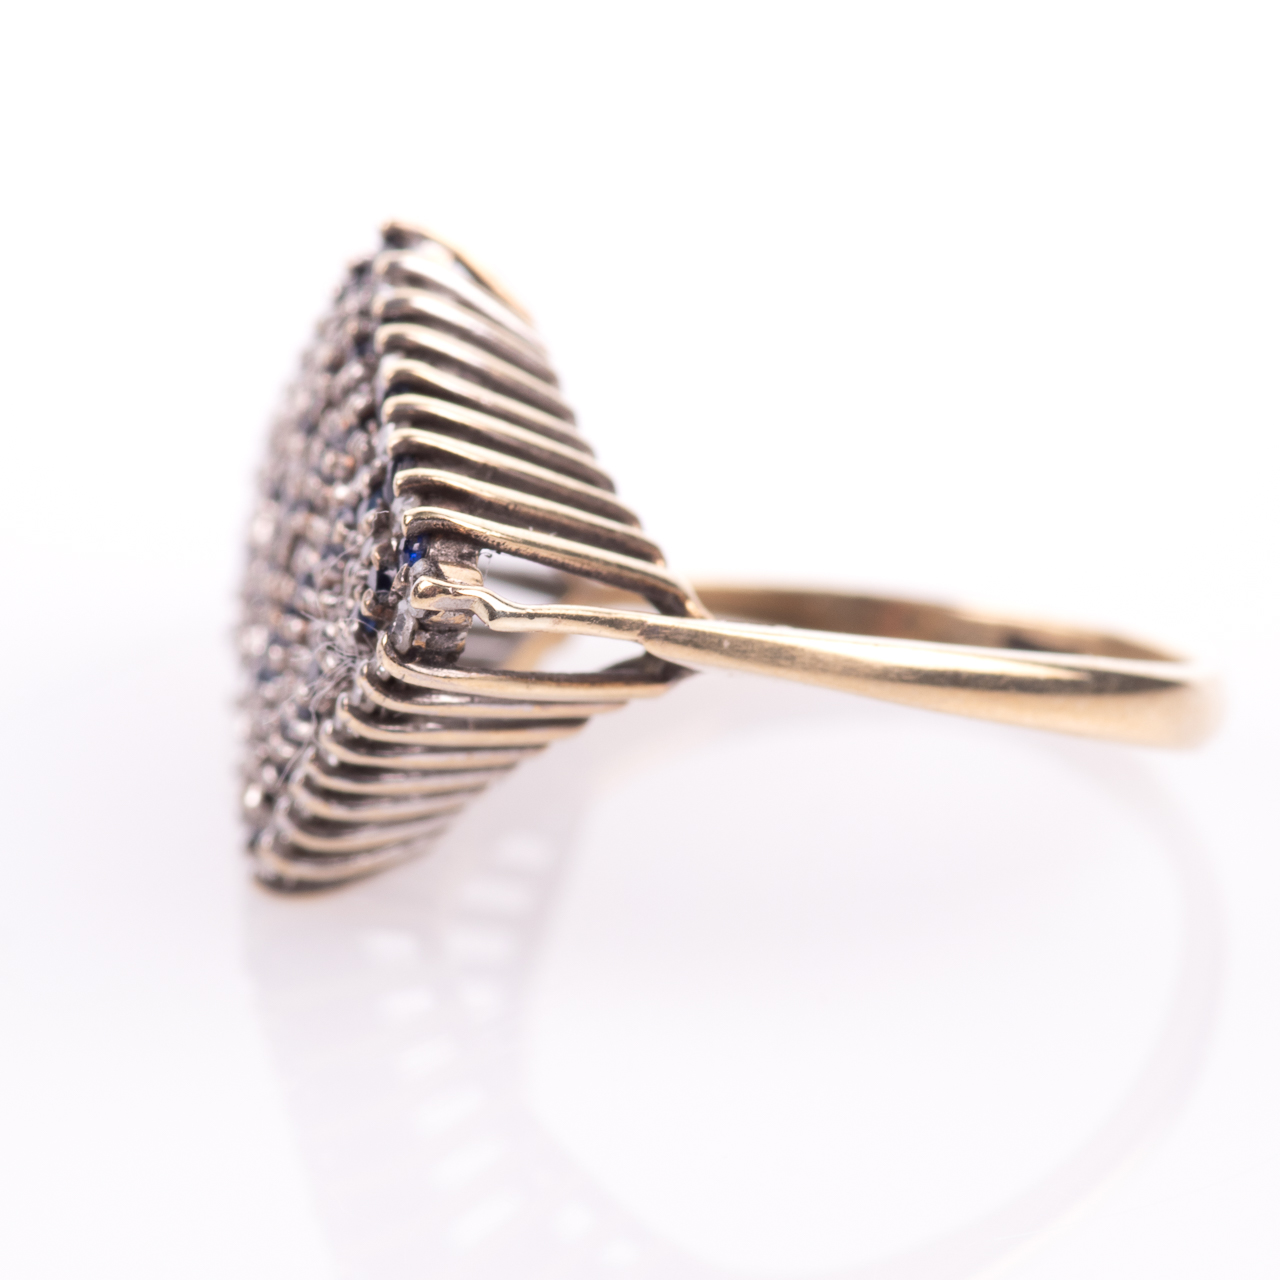 9ct Gold Sapphire & 0.50ct Diamond Ring Sheffield 1979 - Image 4 of 7